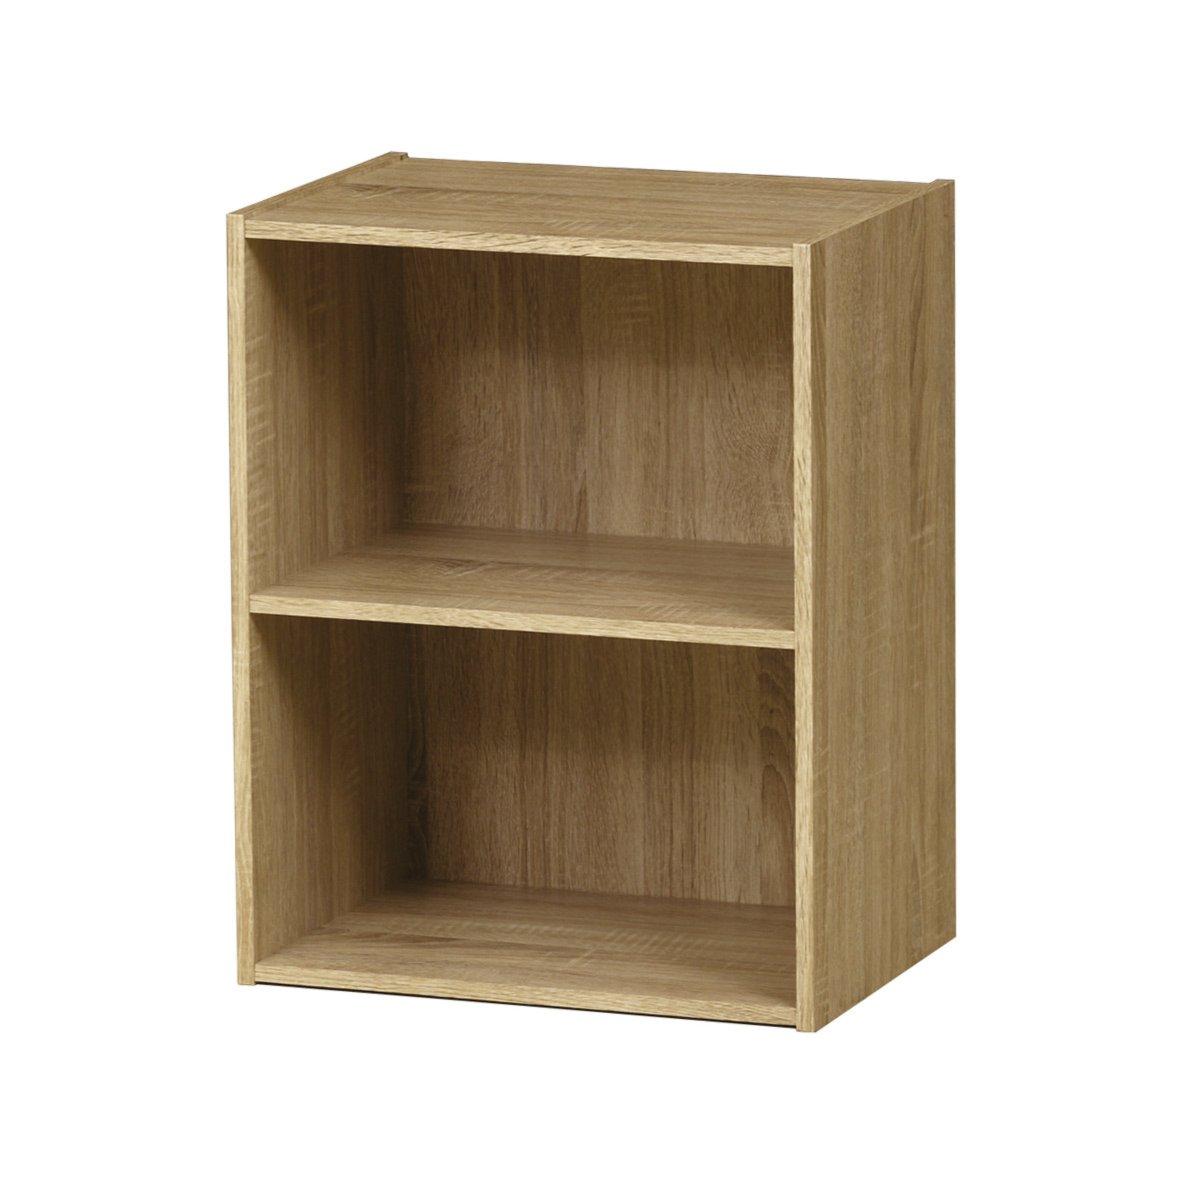 regal polykub eiche sonoma 2 f cher 54 cm standregale regale m bel roller m belhaus. Black Bedroom Furniture Sets. Home Design Ideas